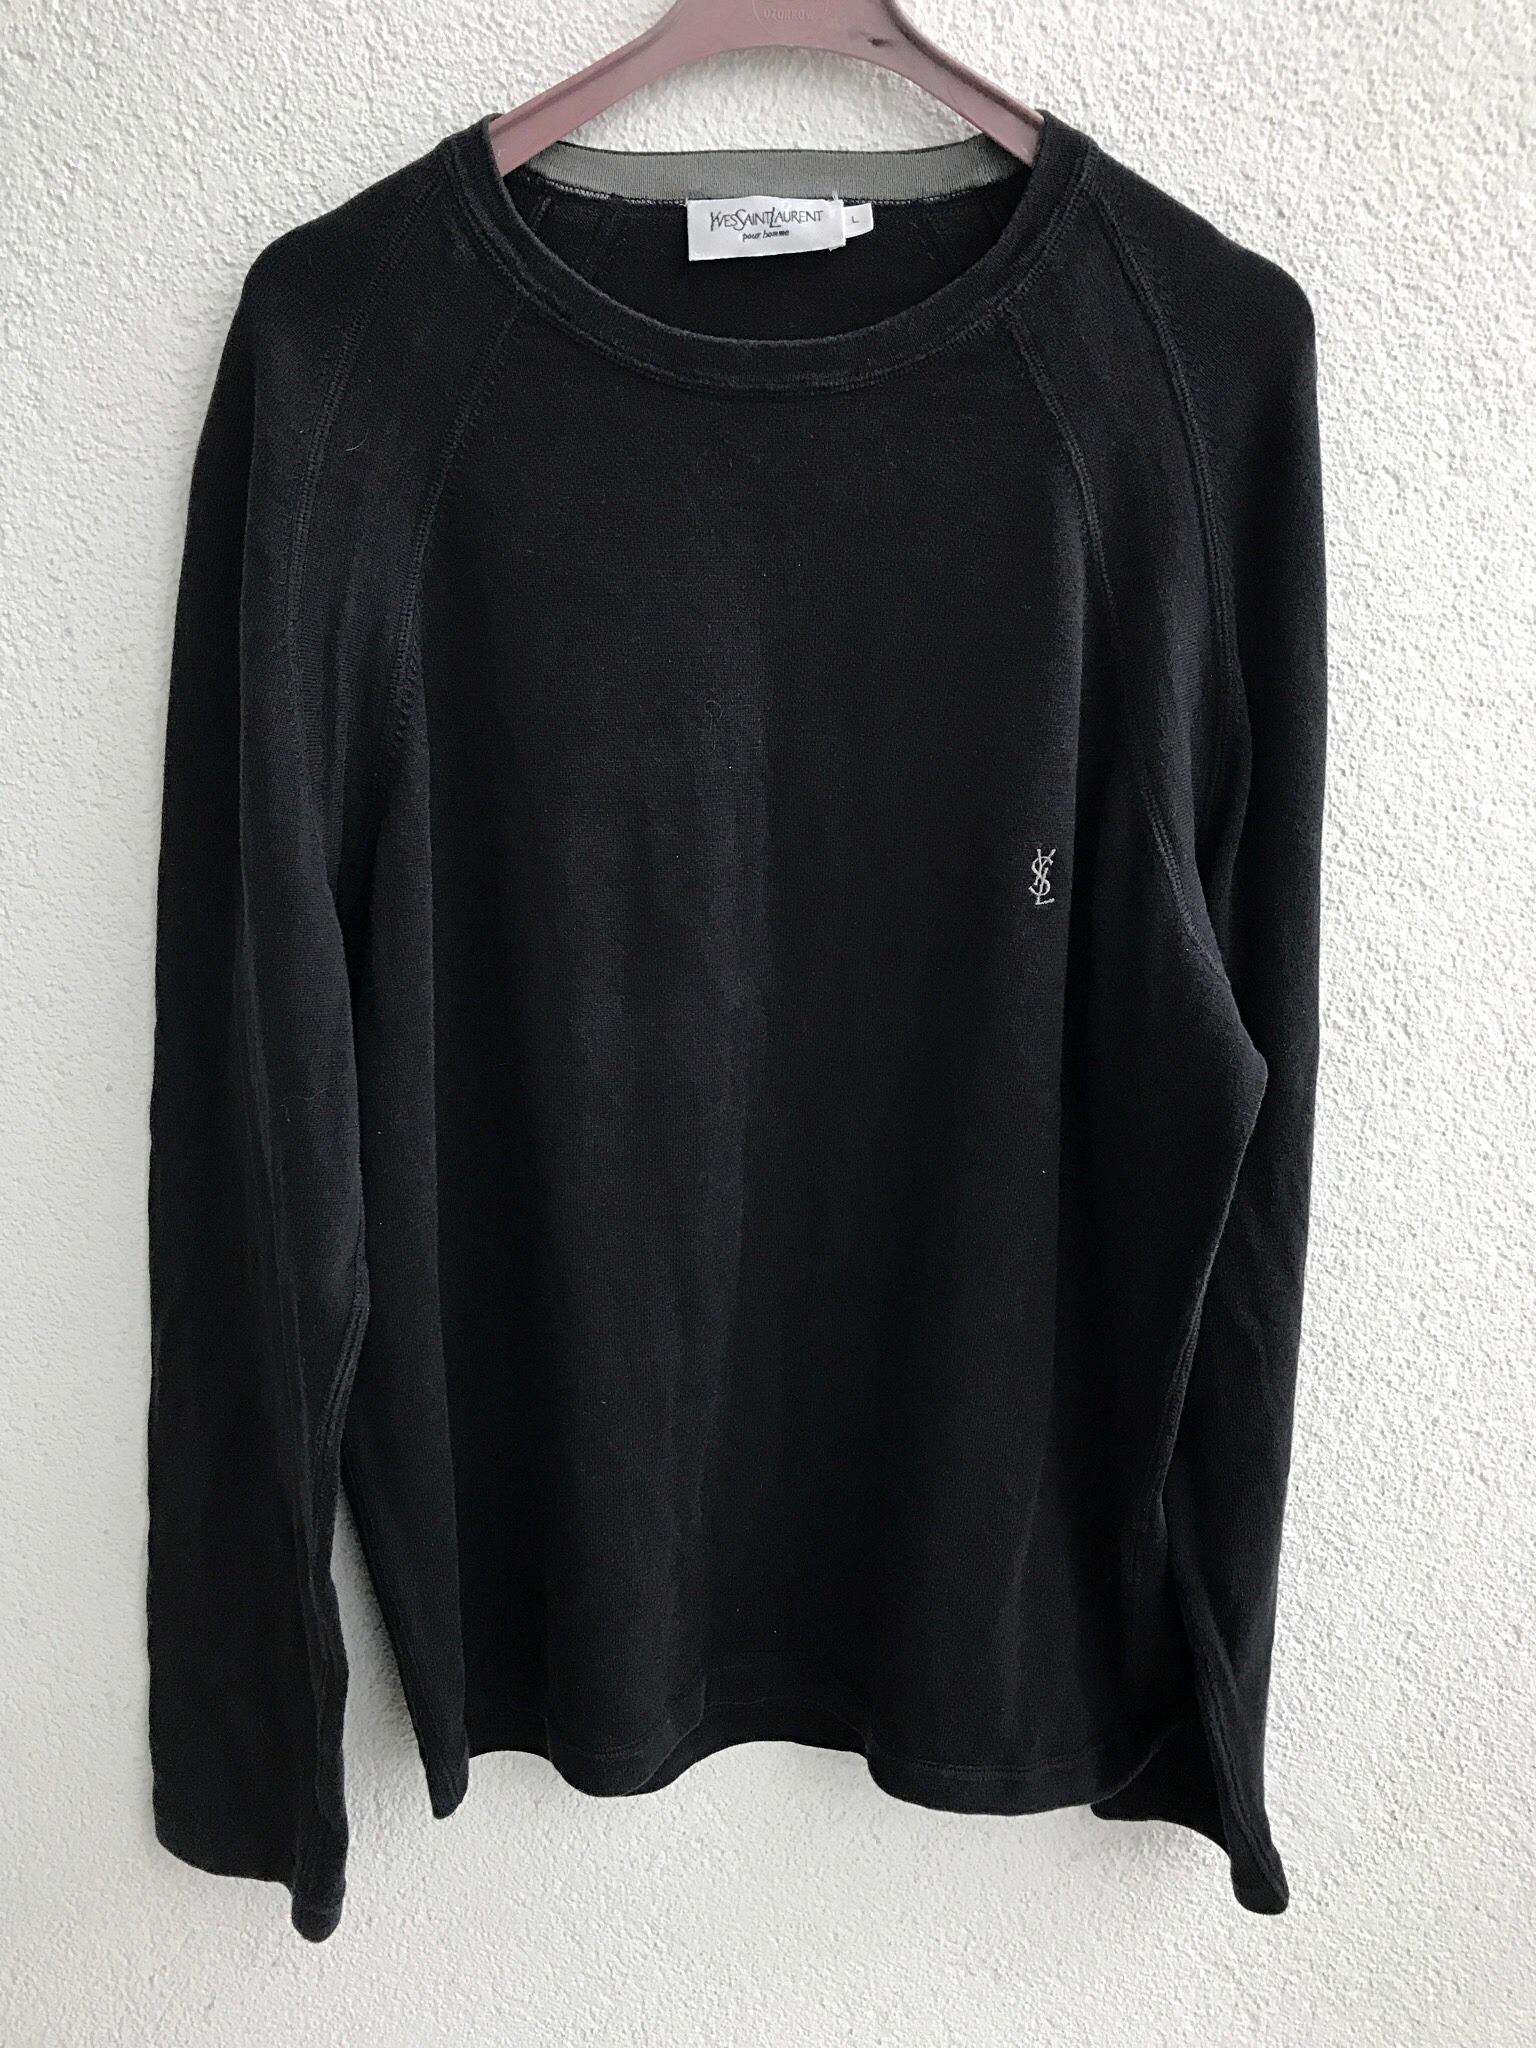 36474777 YSL logo black longsleeve